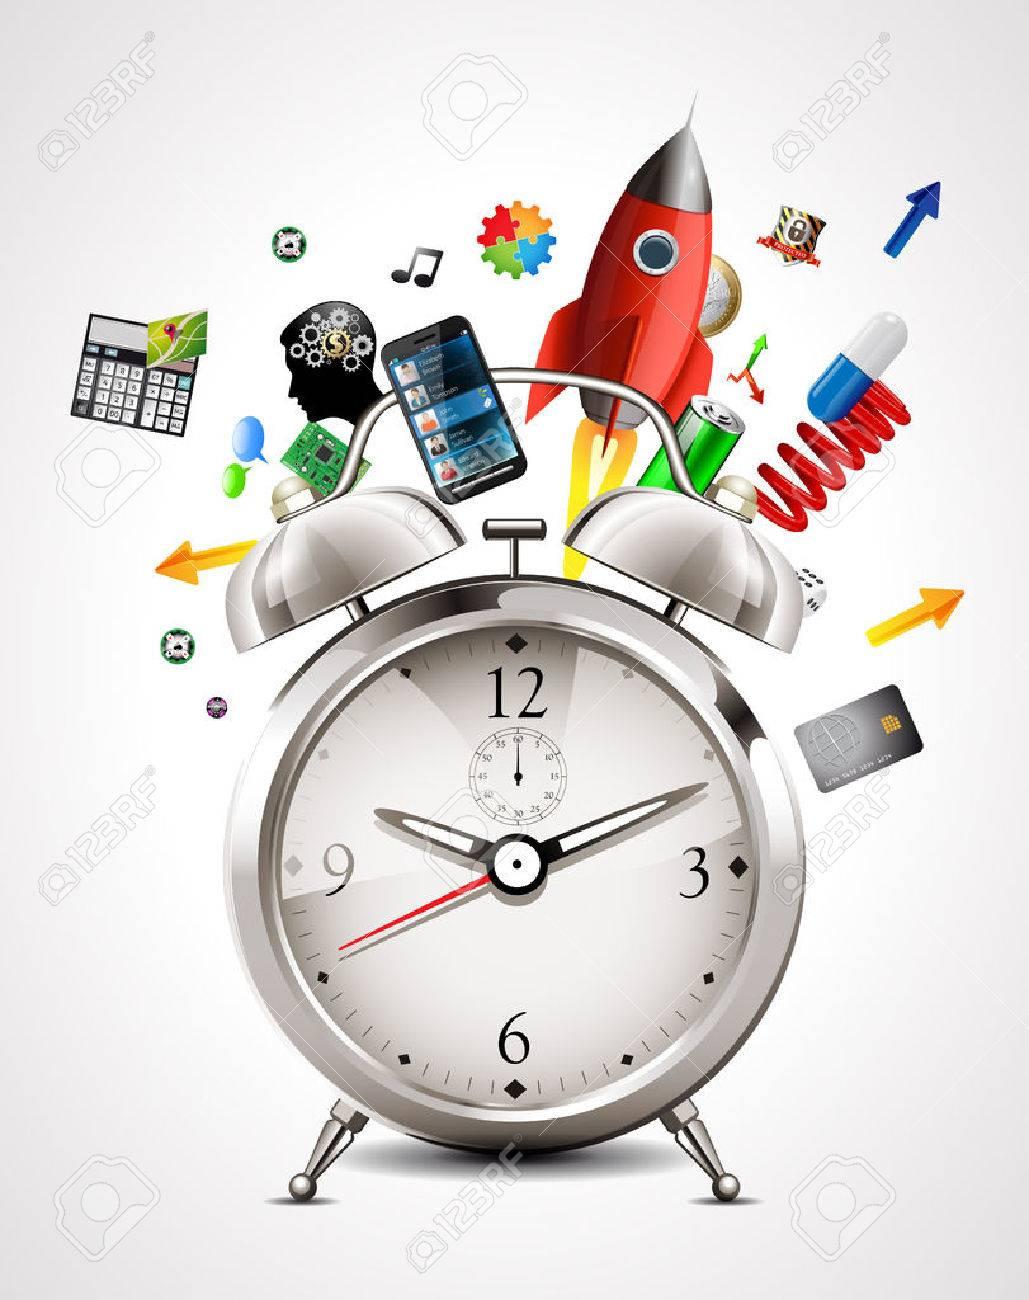 Alarm clock - time management - 47506354